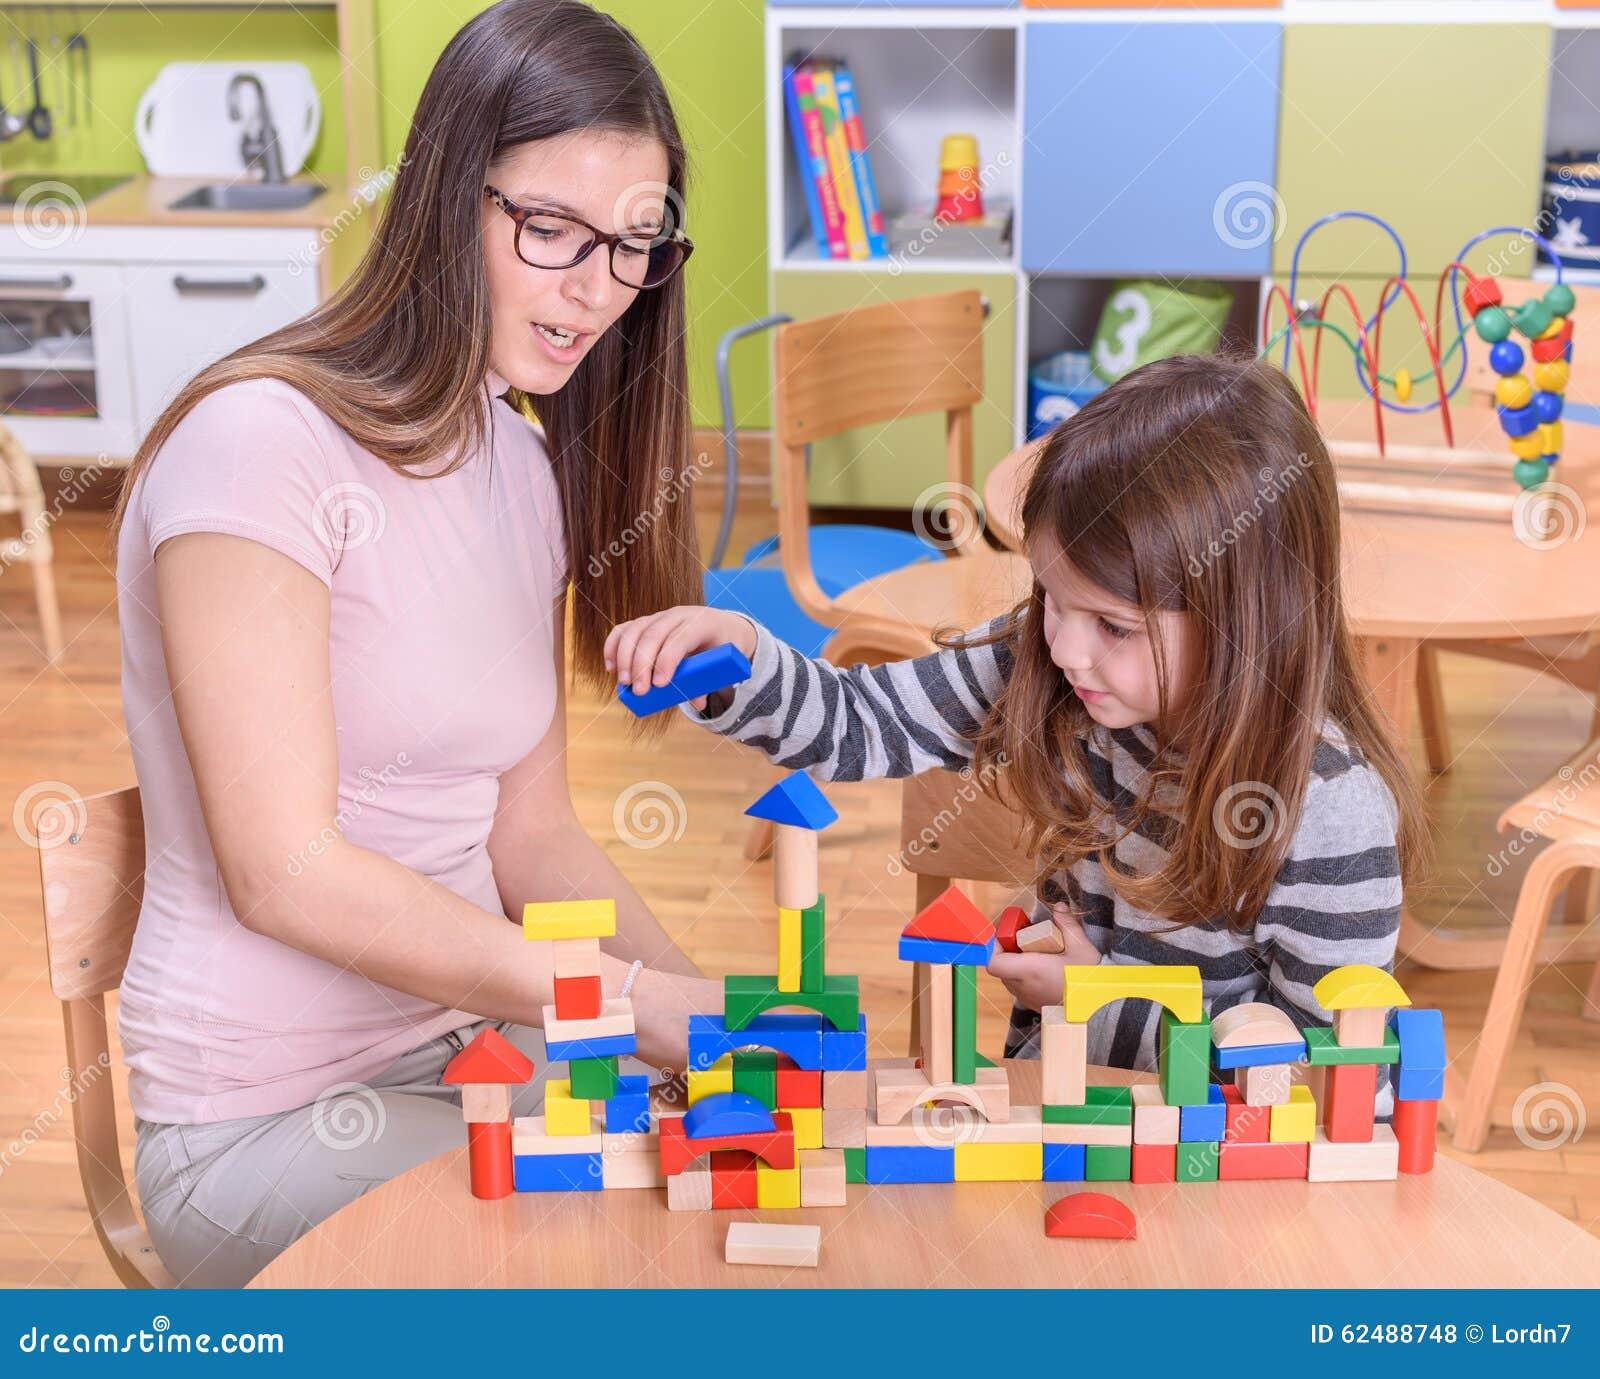 Toys For A Preschool Classroom : Preschool teacher helps cute girl to build toy castle